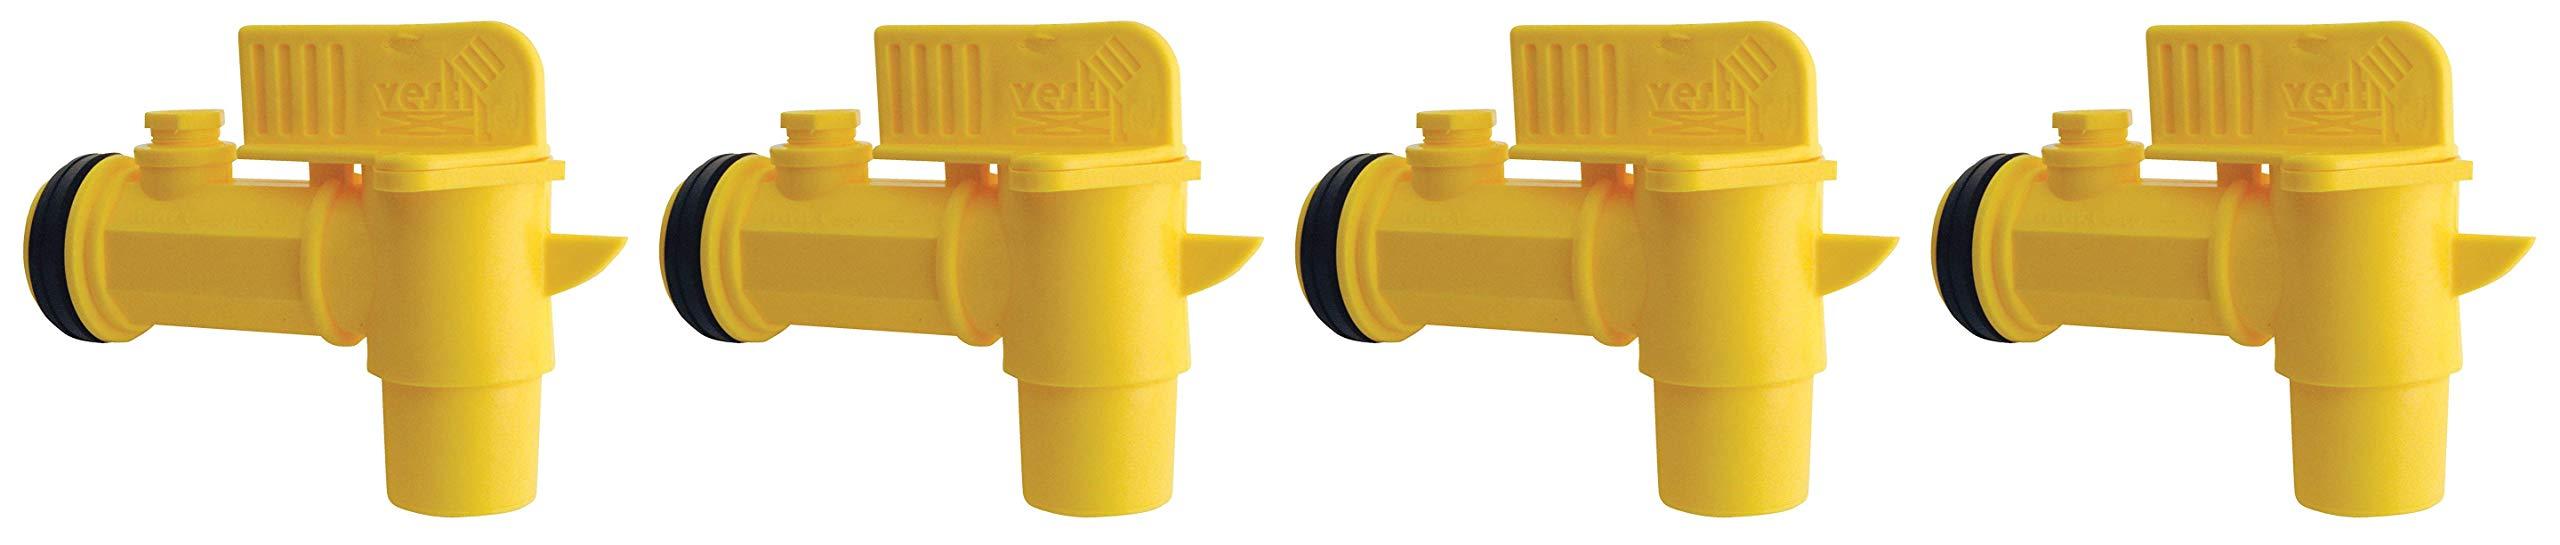 Vestil JDFT Plastic Manual Handle Jumbo Drum Faucet, Fits 2'' Drum Openings (Fоur Paсk, Yellow)